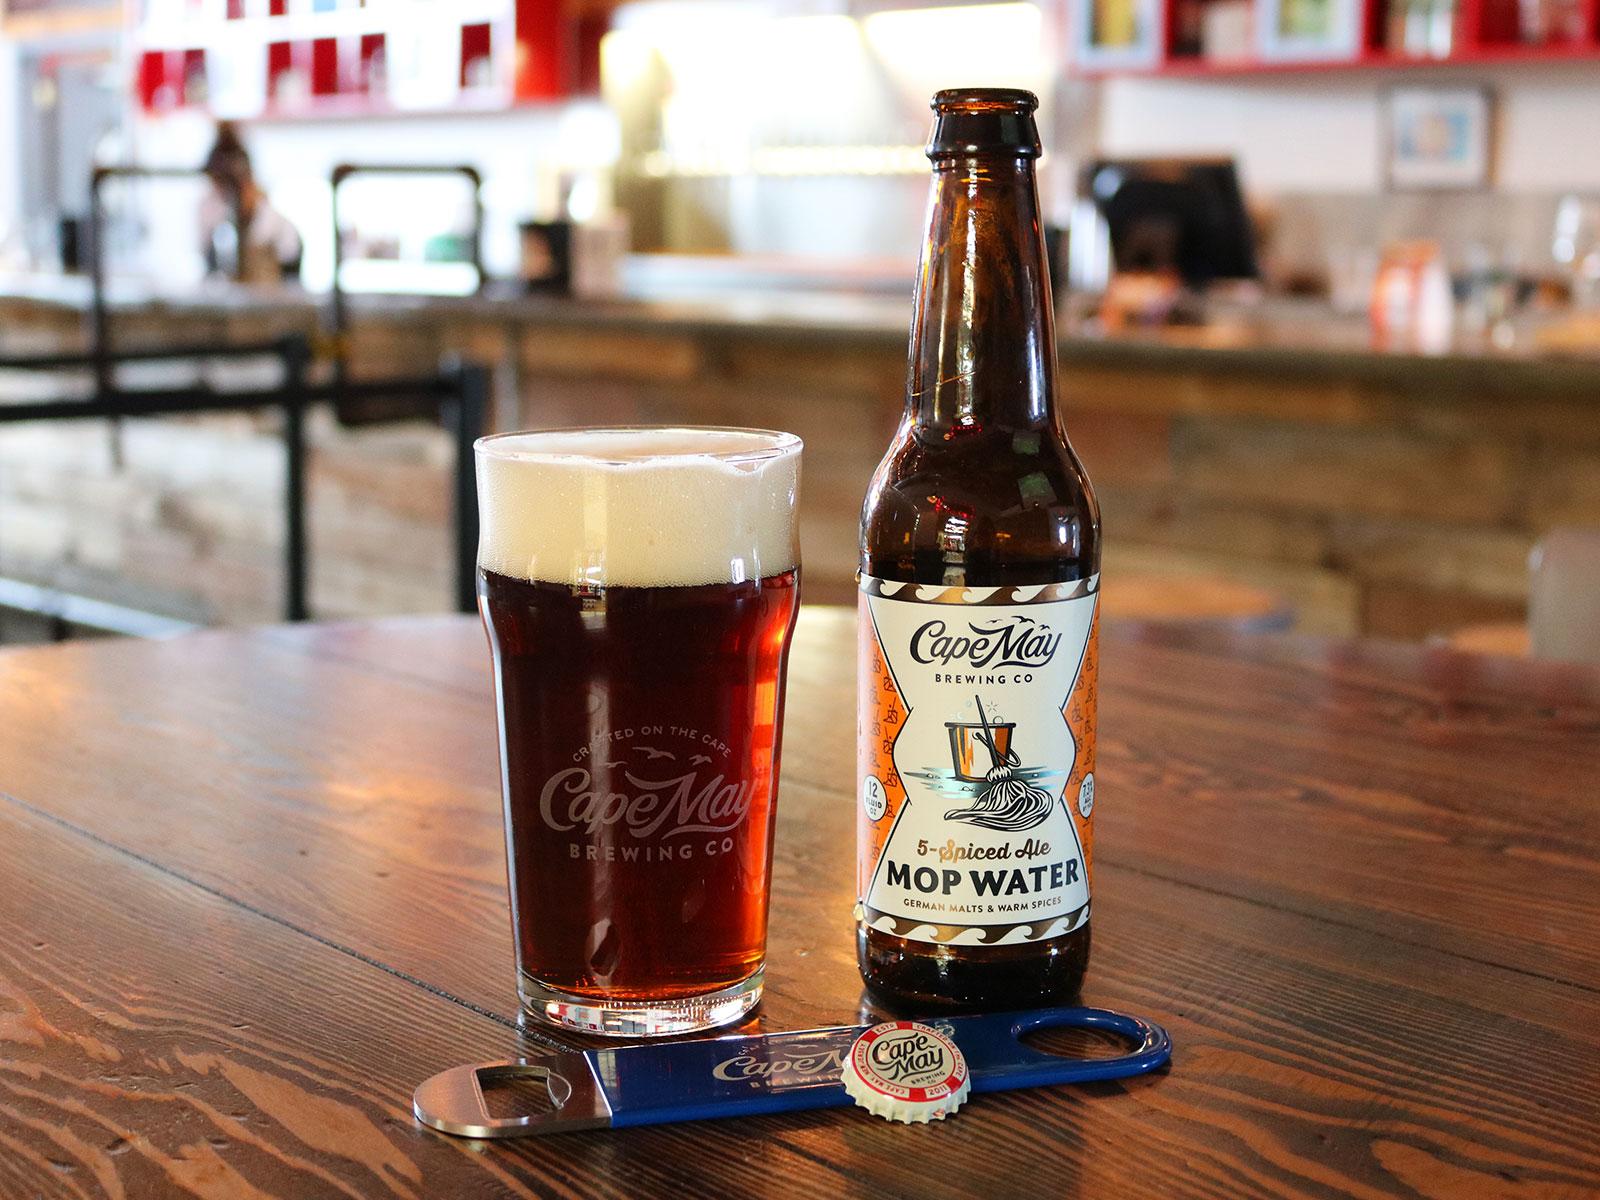 cape may mop water beer